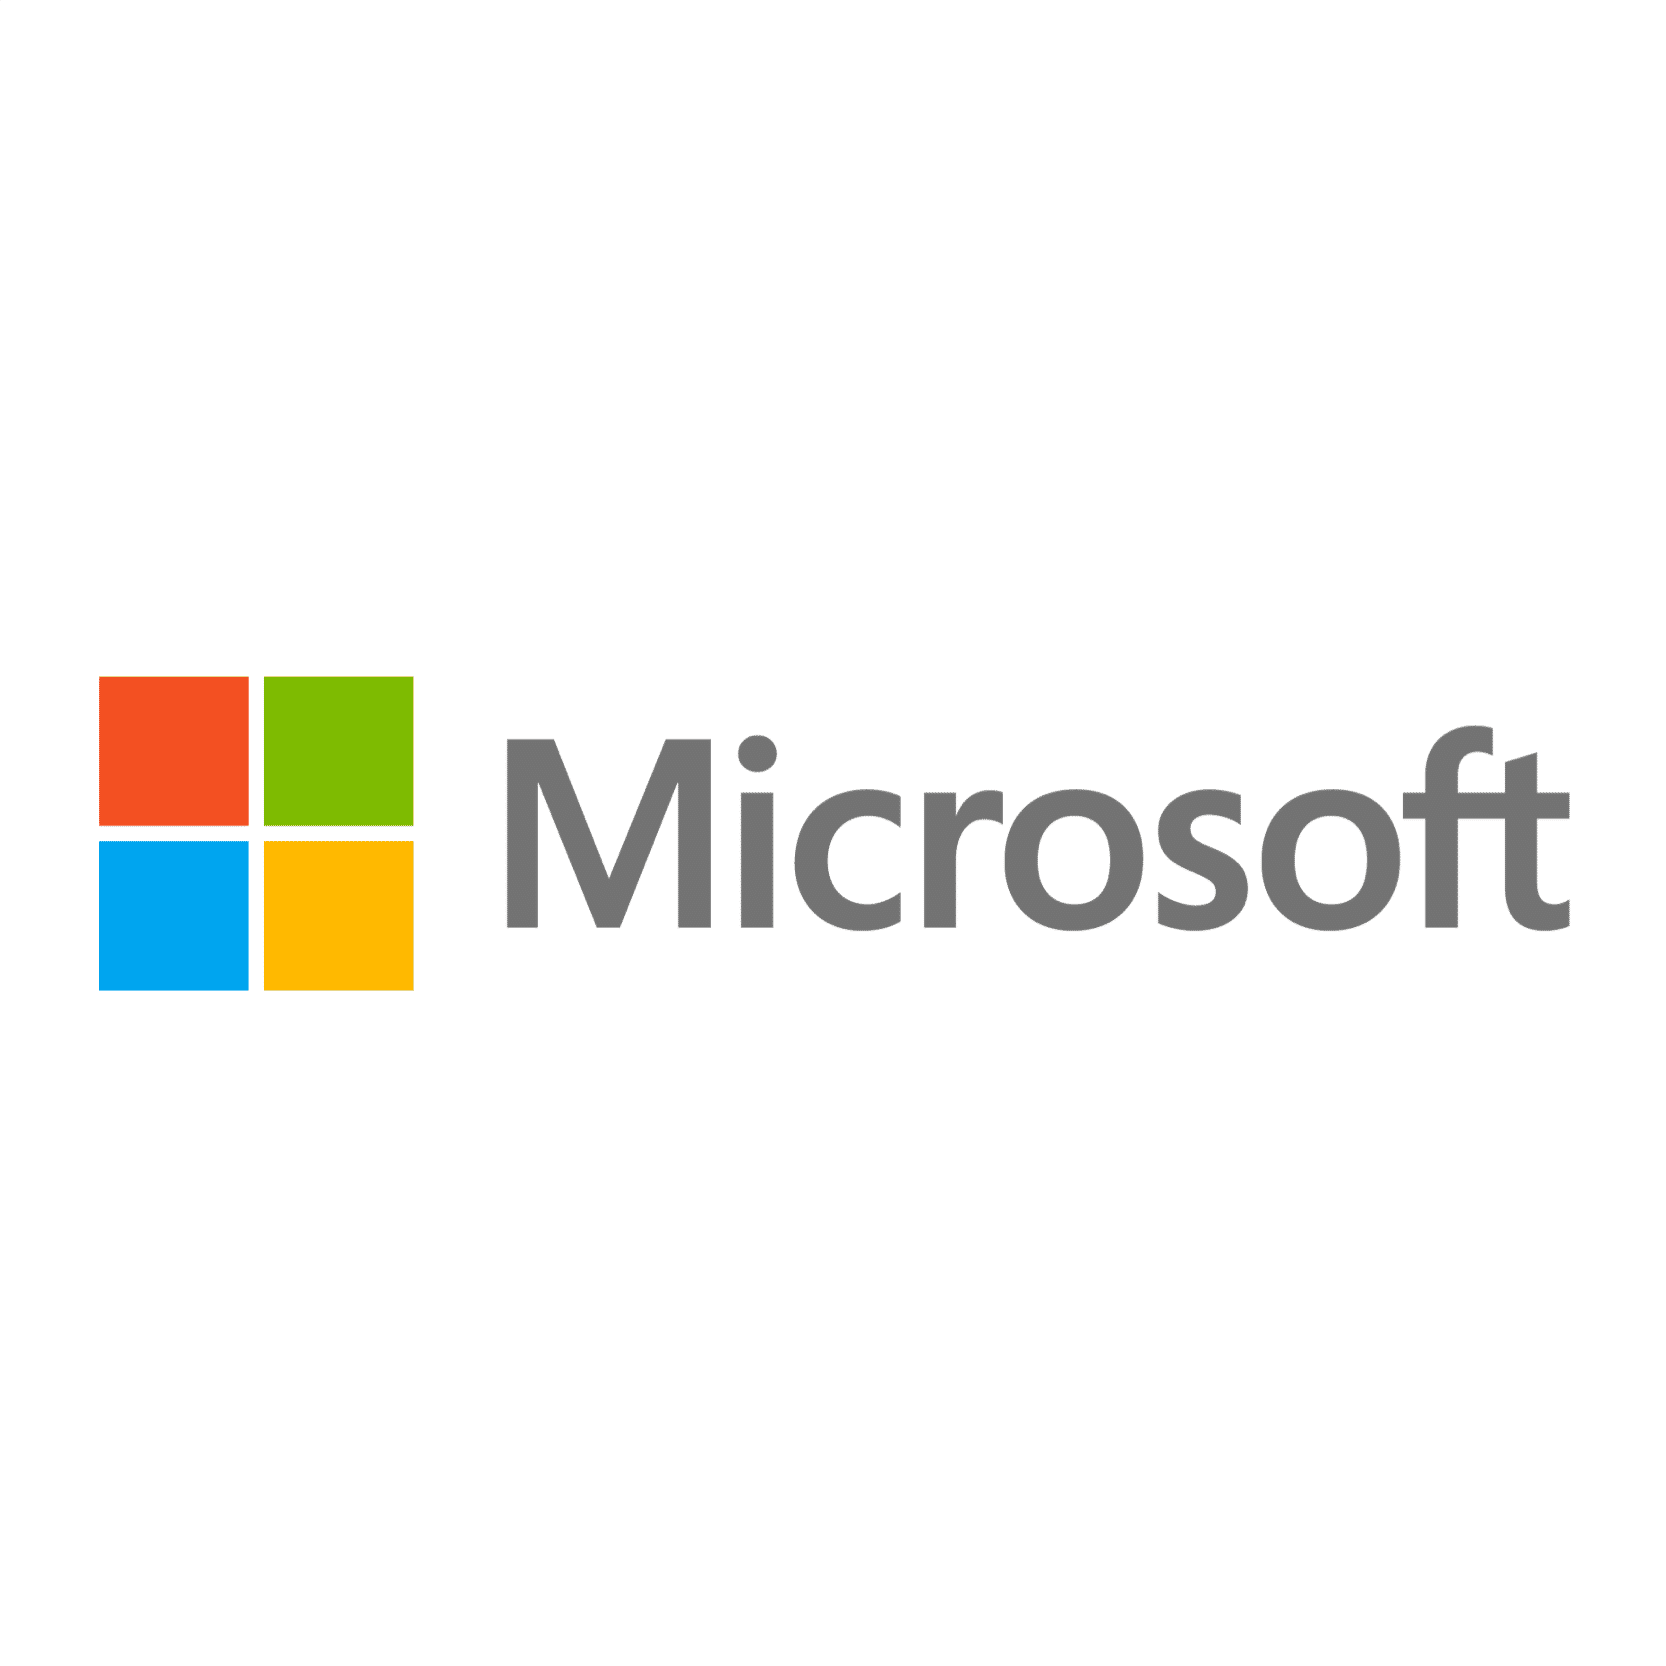 Download Microsoft Windows 10 IoT Core - Microsoft Windows 10 PNG